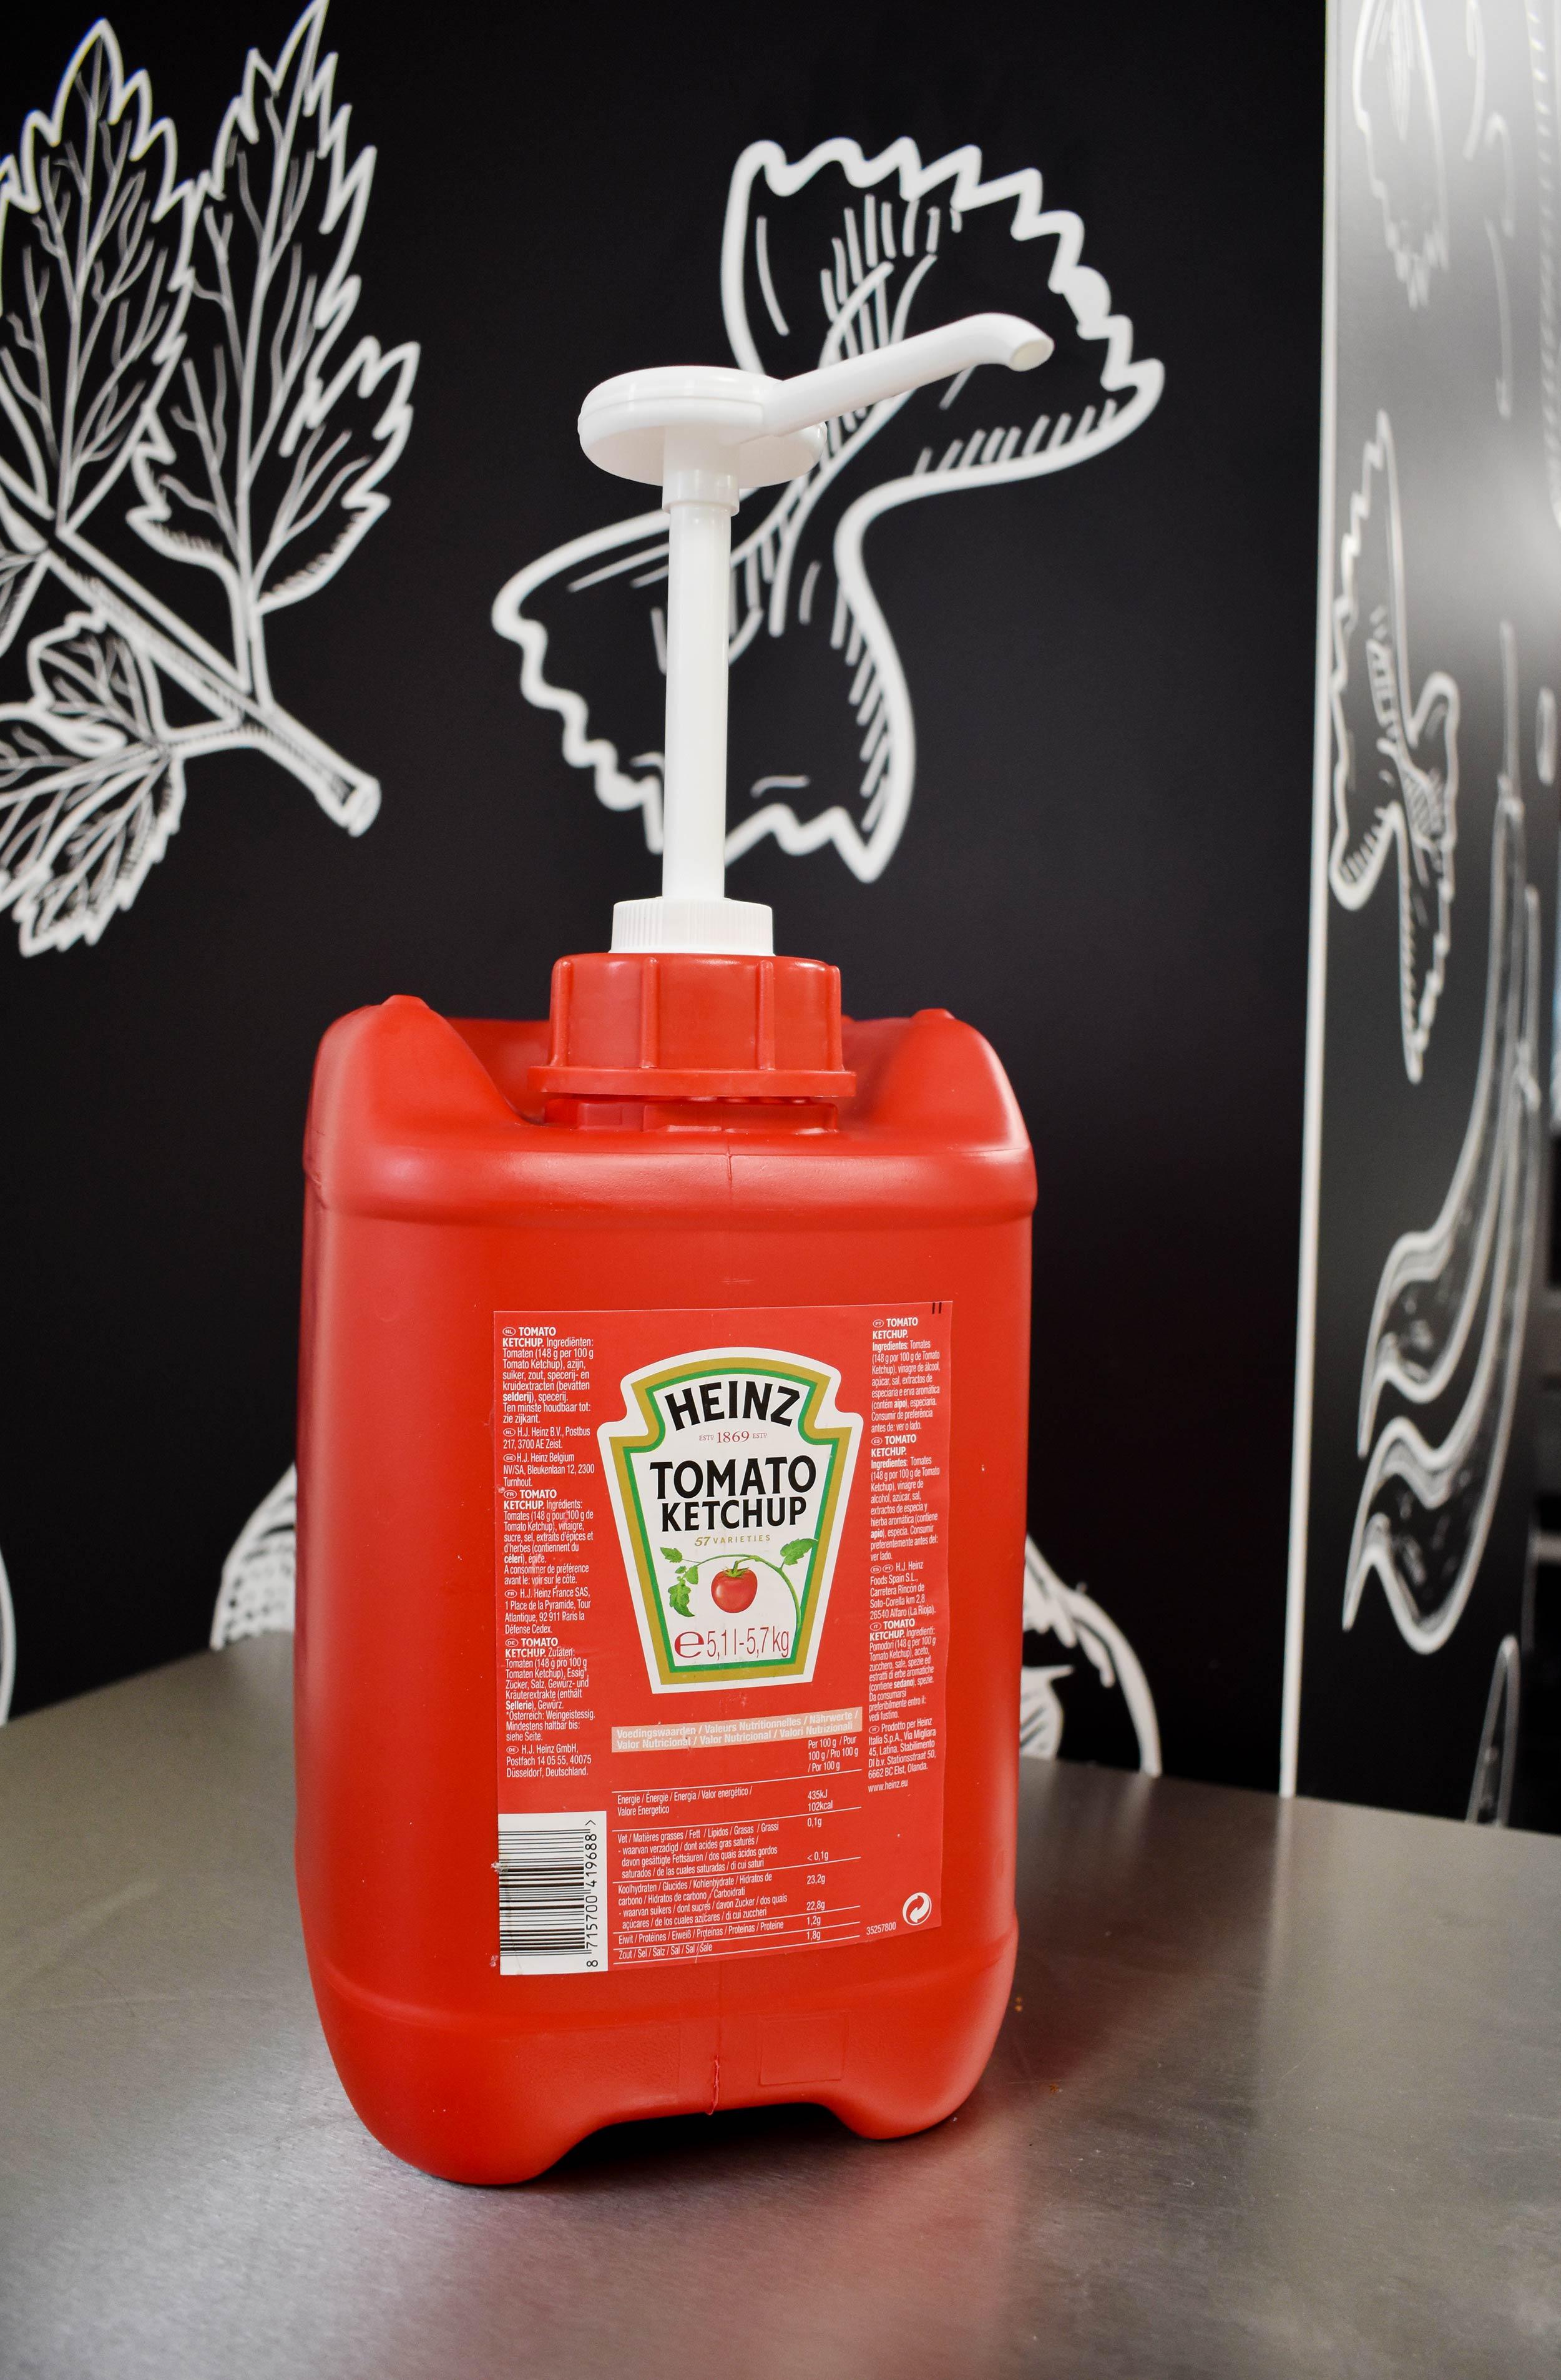 Heinz Tomato Ketchup 5,1l Kanister